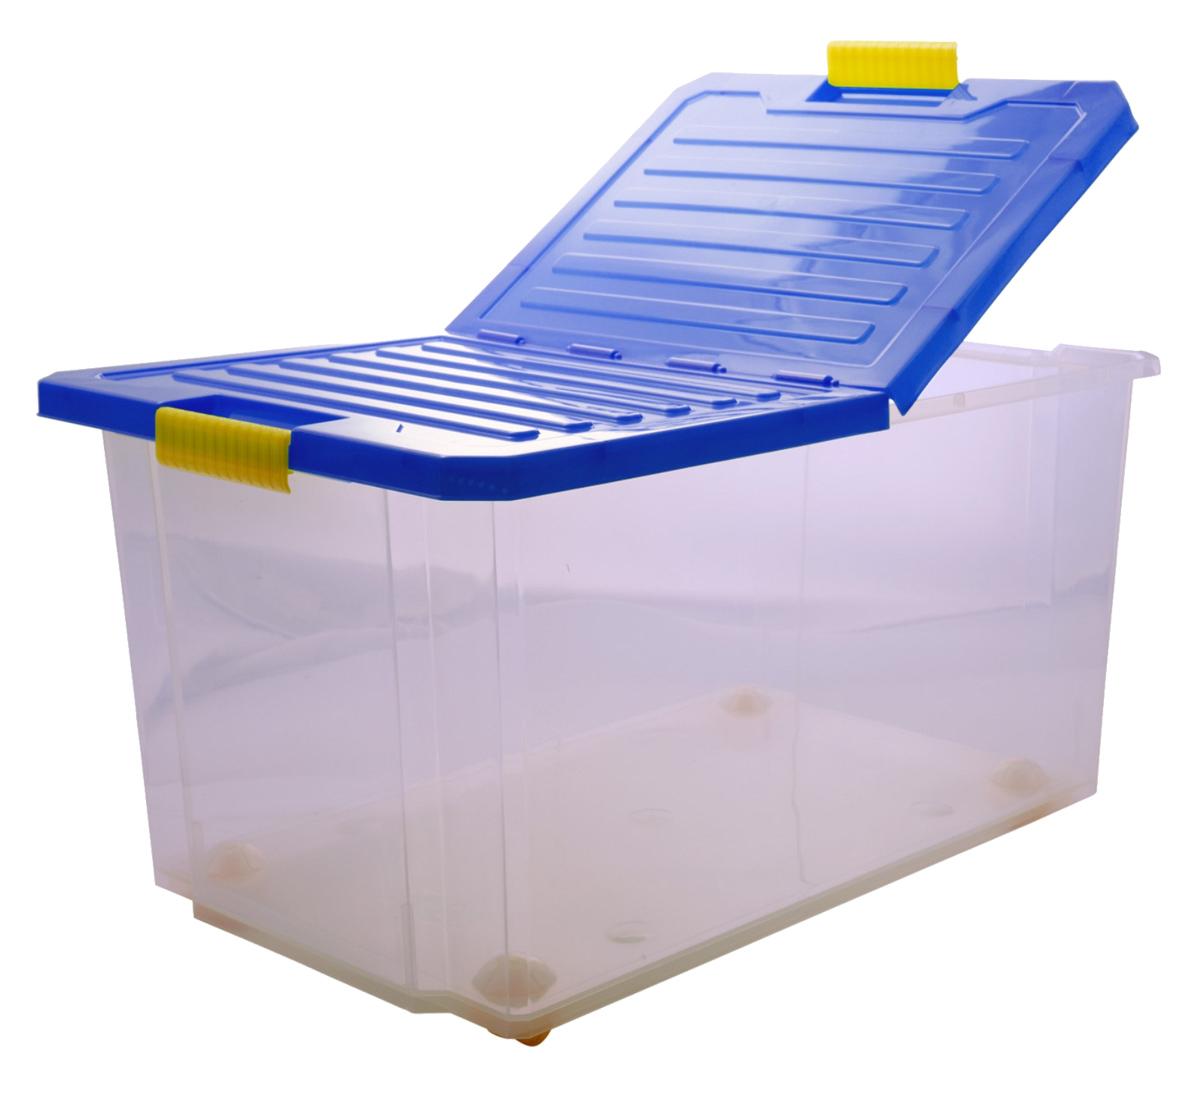 Ящик для хранения BranQ Unibox, на колесиках, цвет: синий, прозрачный, 57 л ящик для хранения branq optima город 30 л